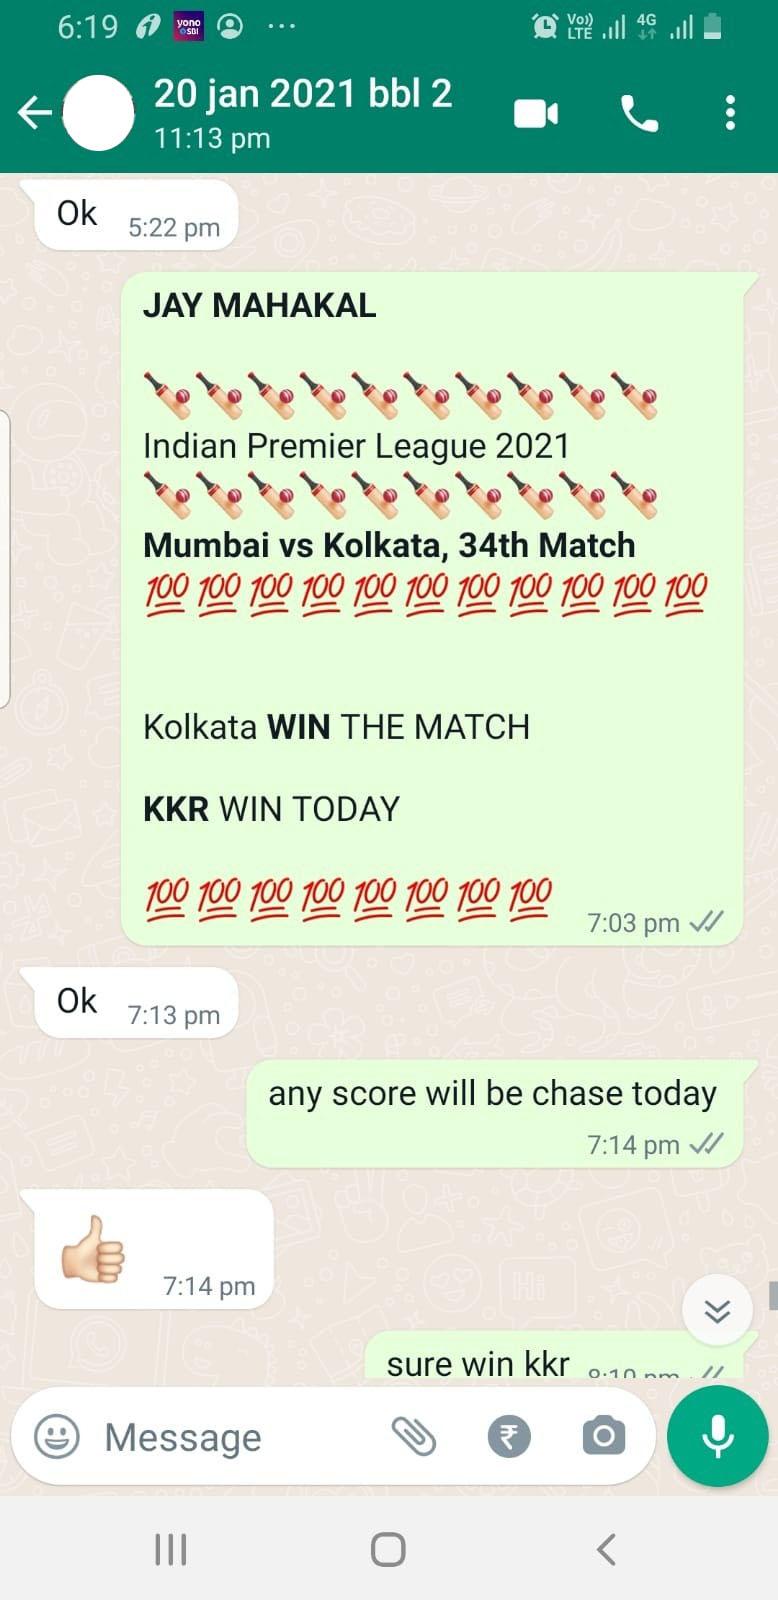 Last match Sure Shot Prediction Screenshot